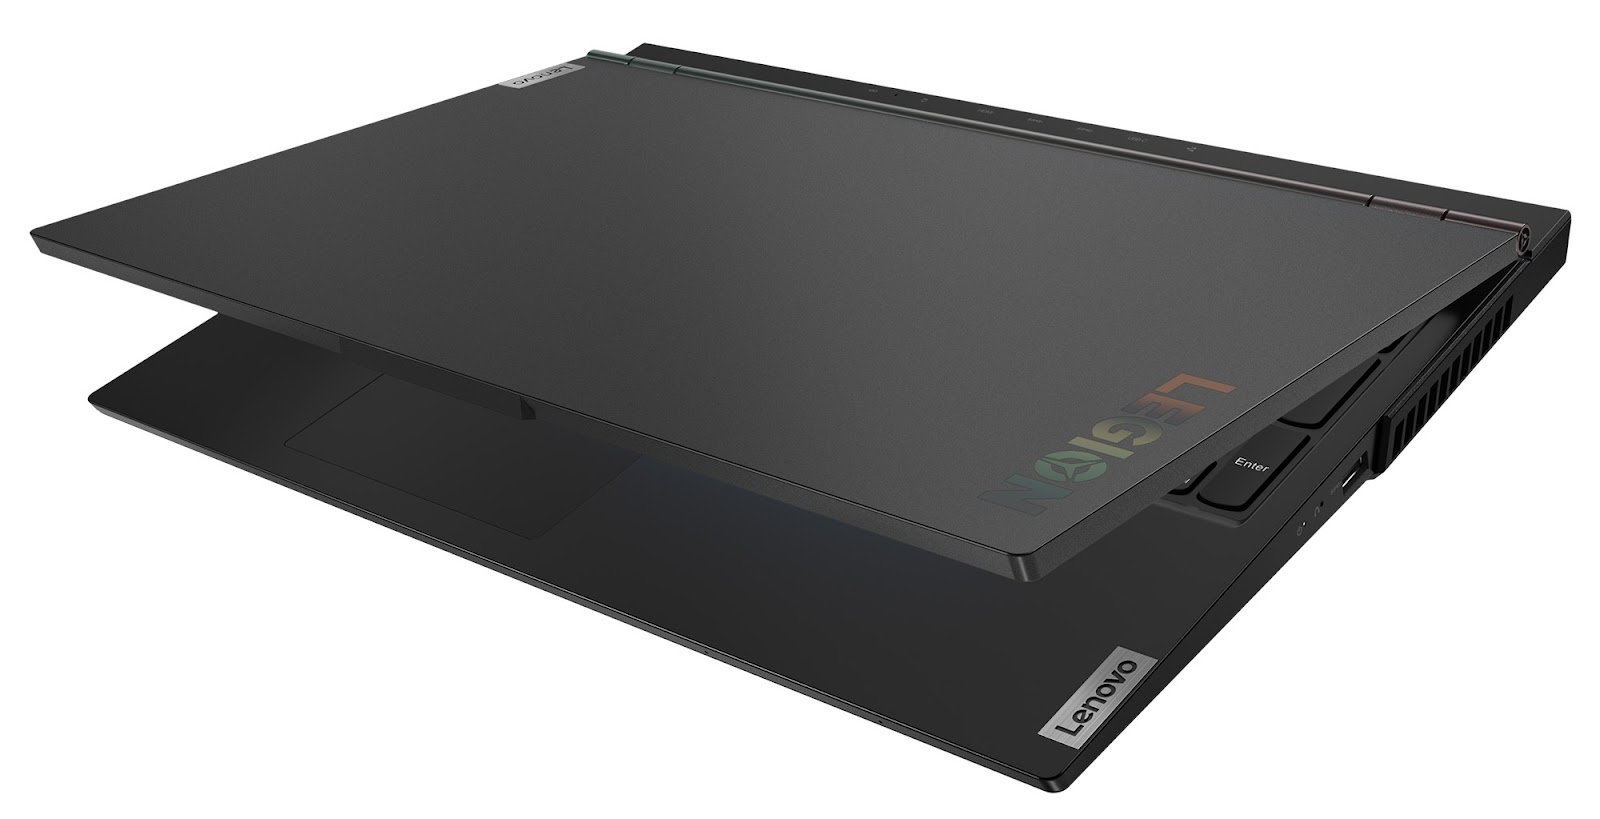 Фото 3. Ноутбук Lenovo Legion 5 15IMH05H Phantom Black (81Y600CXRE)